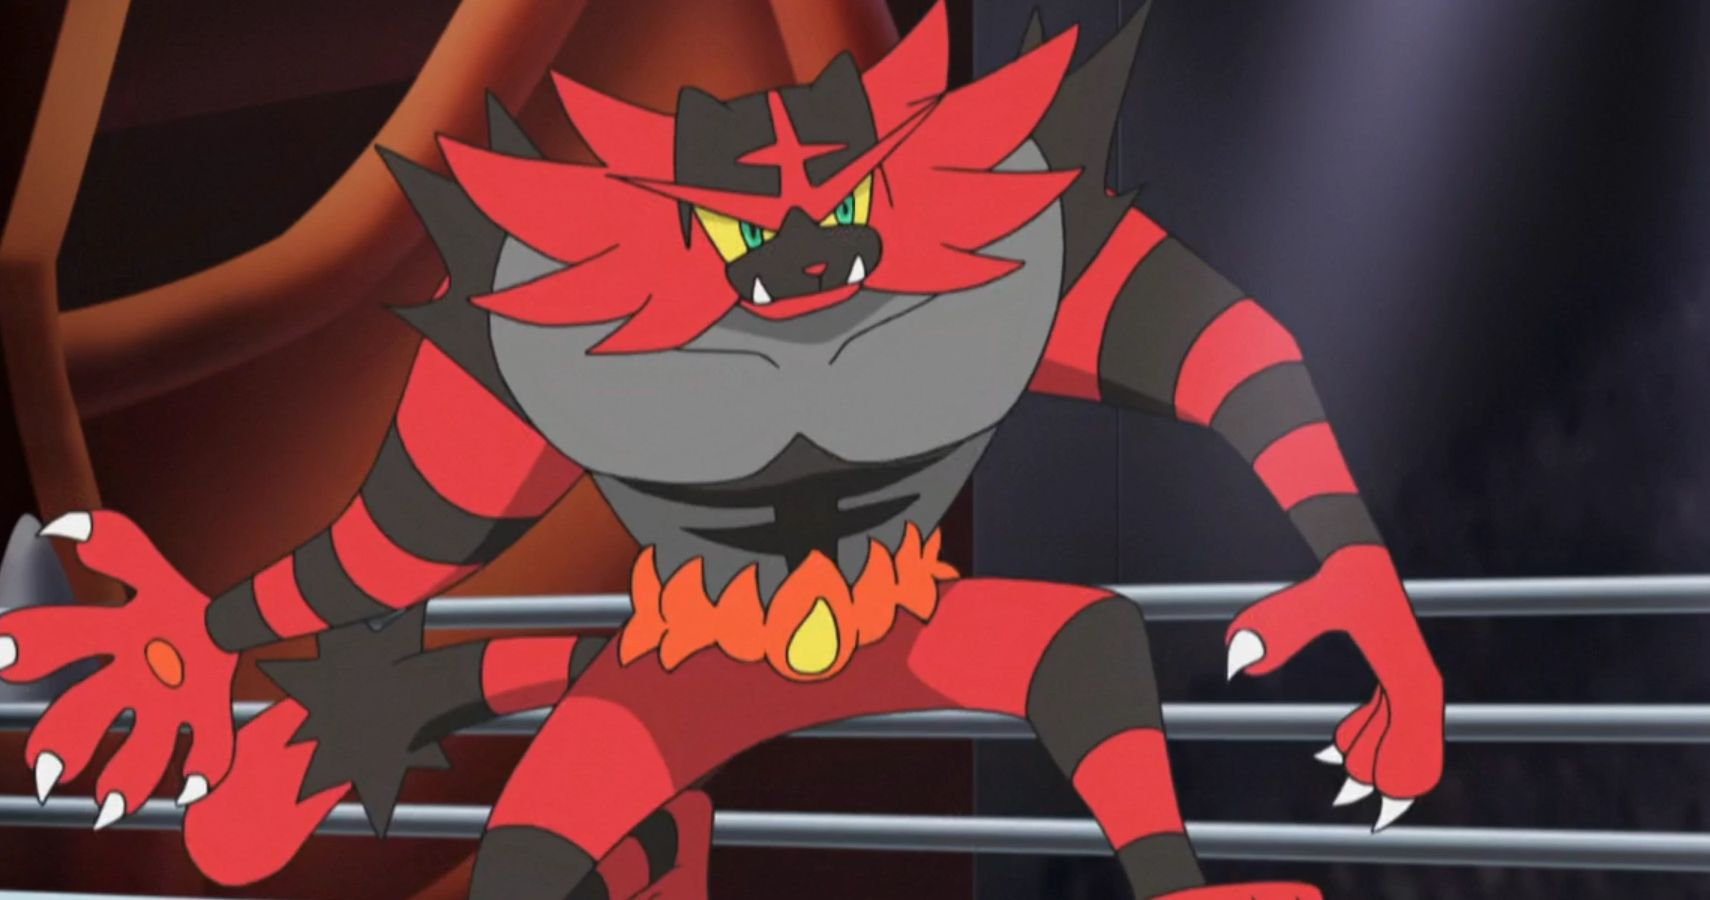 Rumor: Next Smash Bros  Characters Are Pokémon's Incineroar